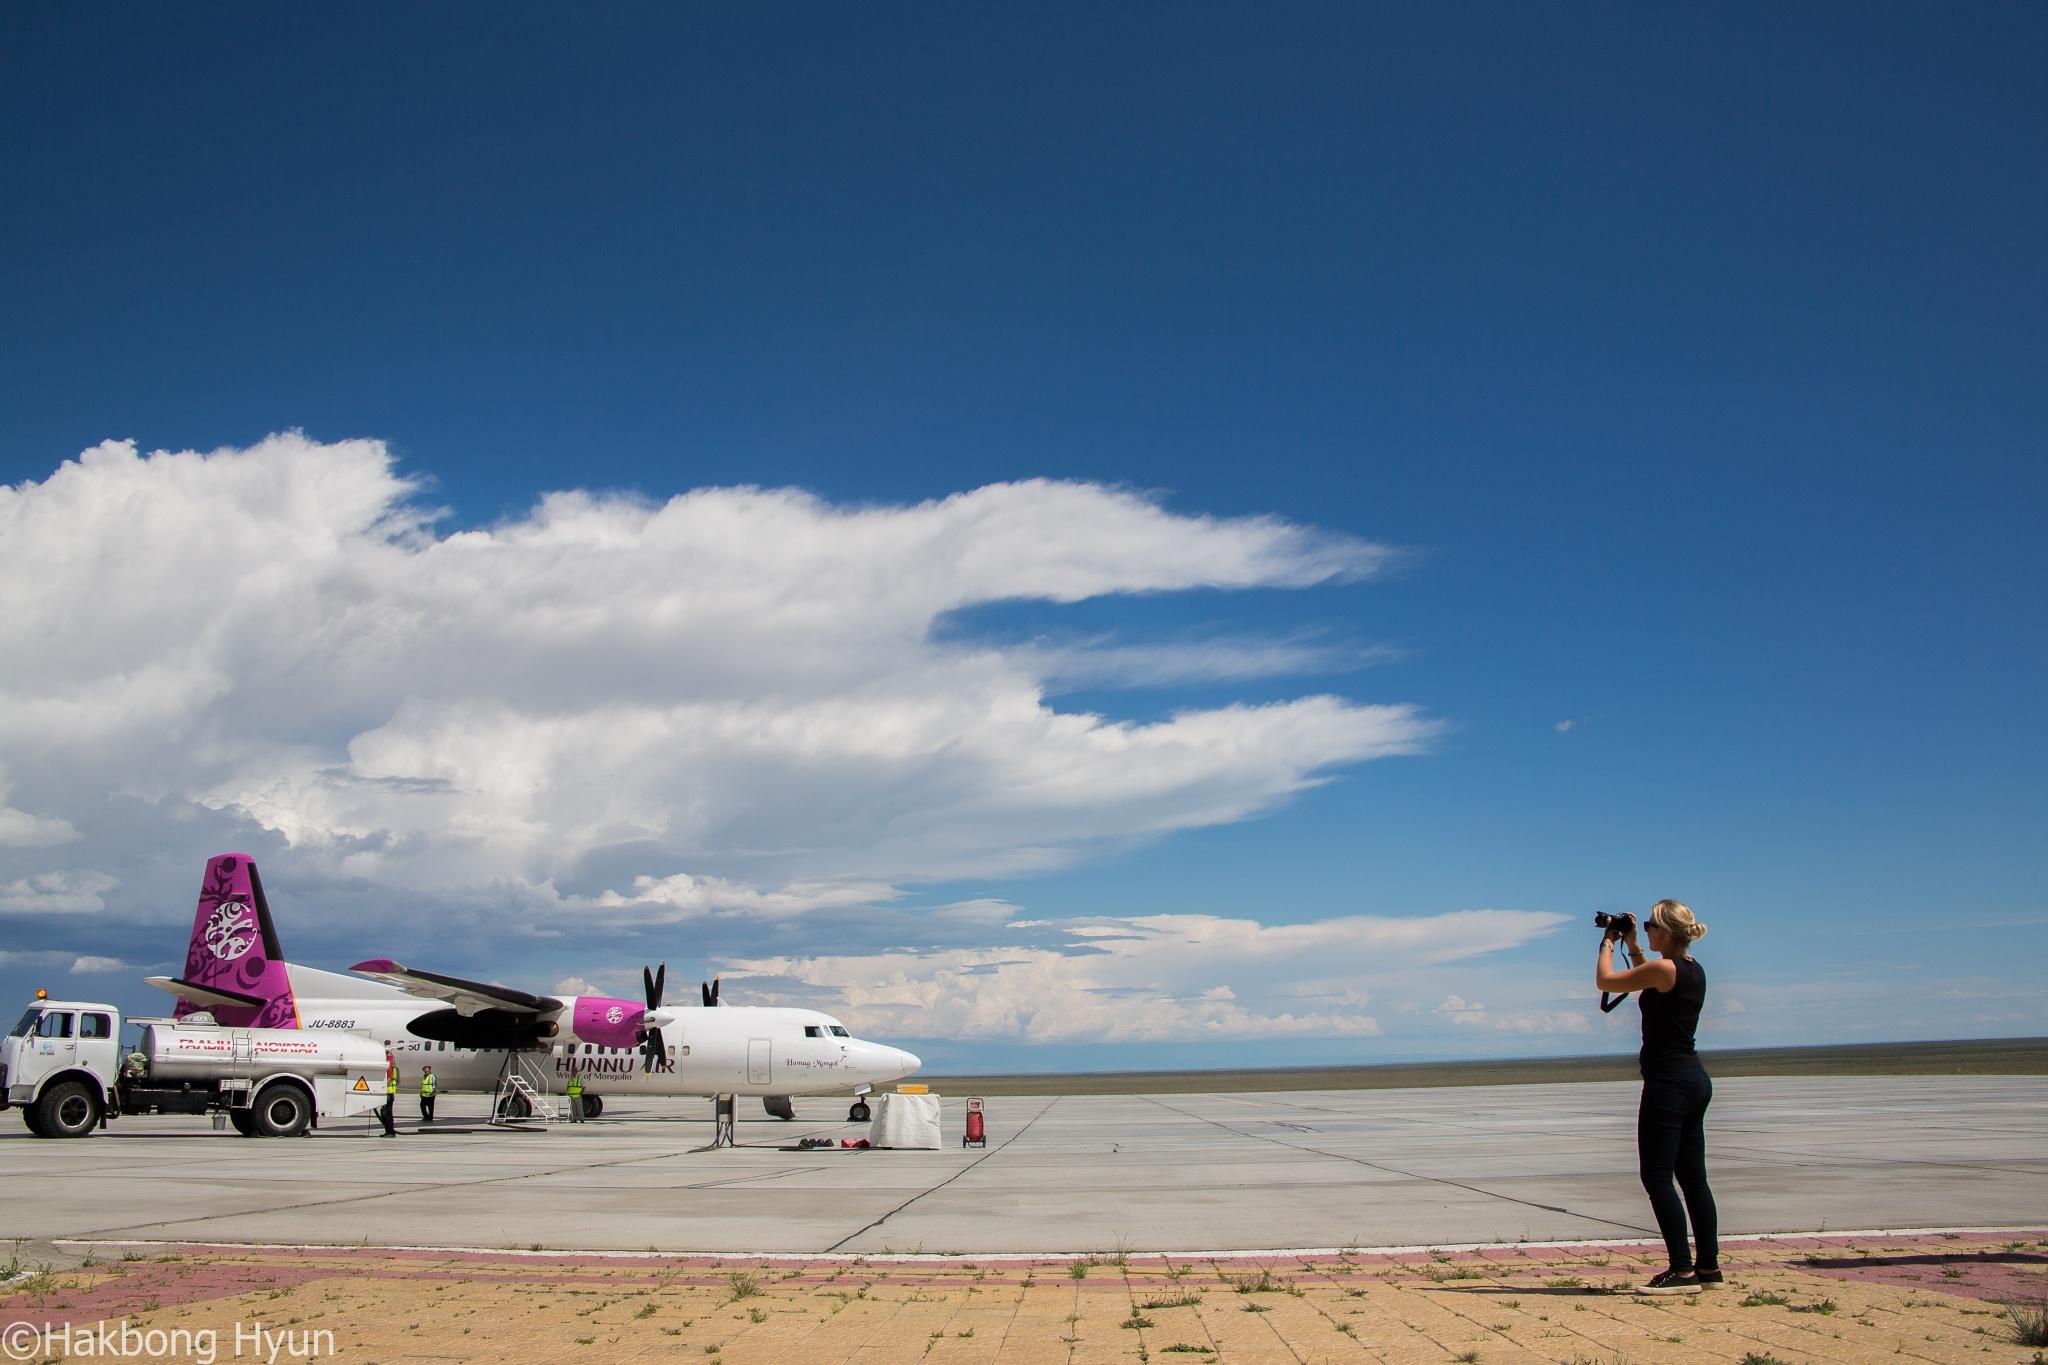 During visit khovsgol in Mongolia last week by hakbonghyun